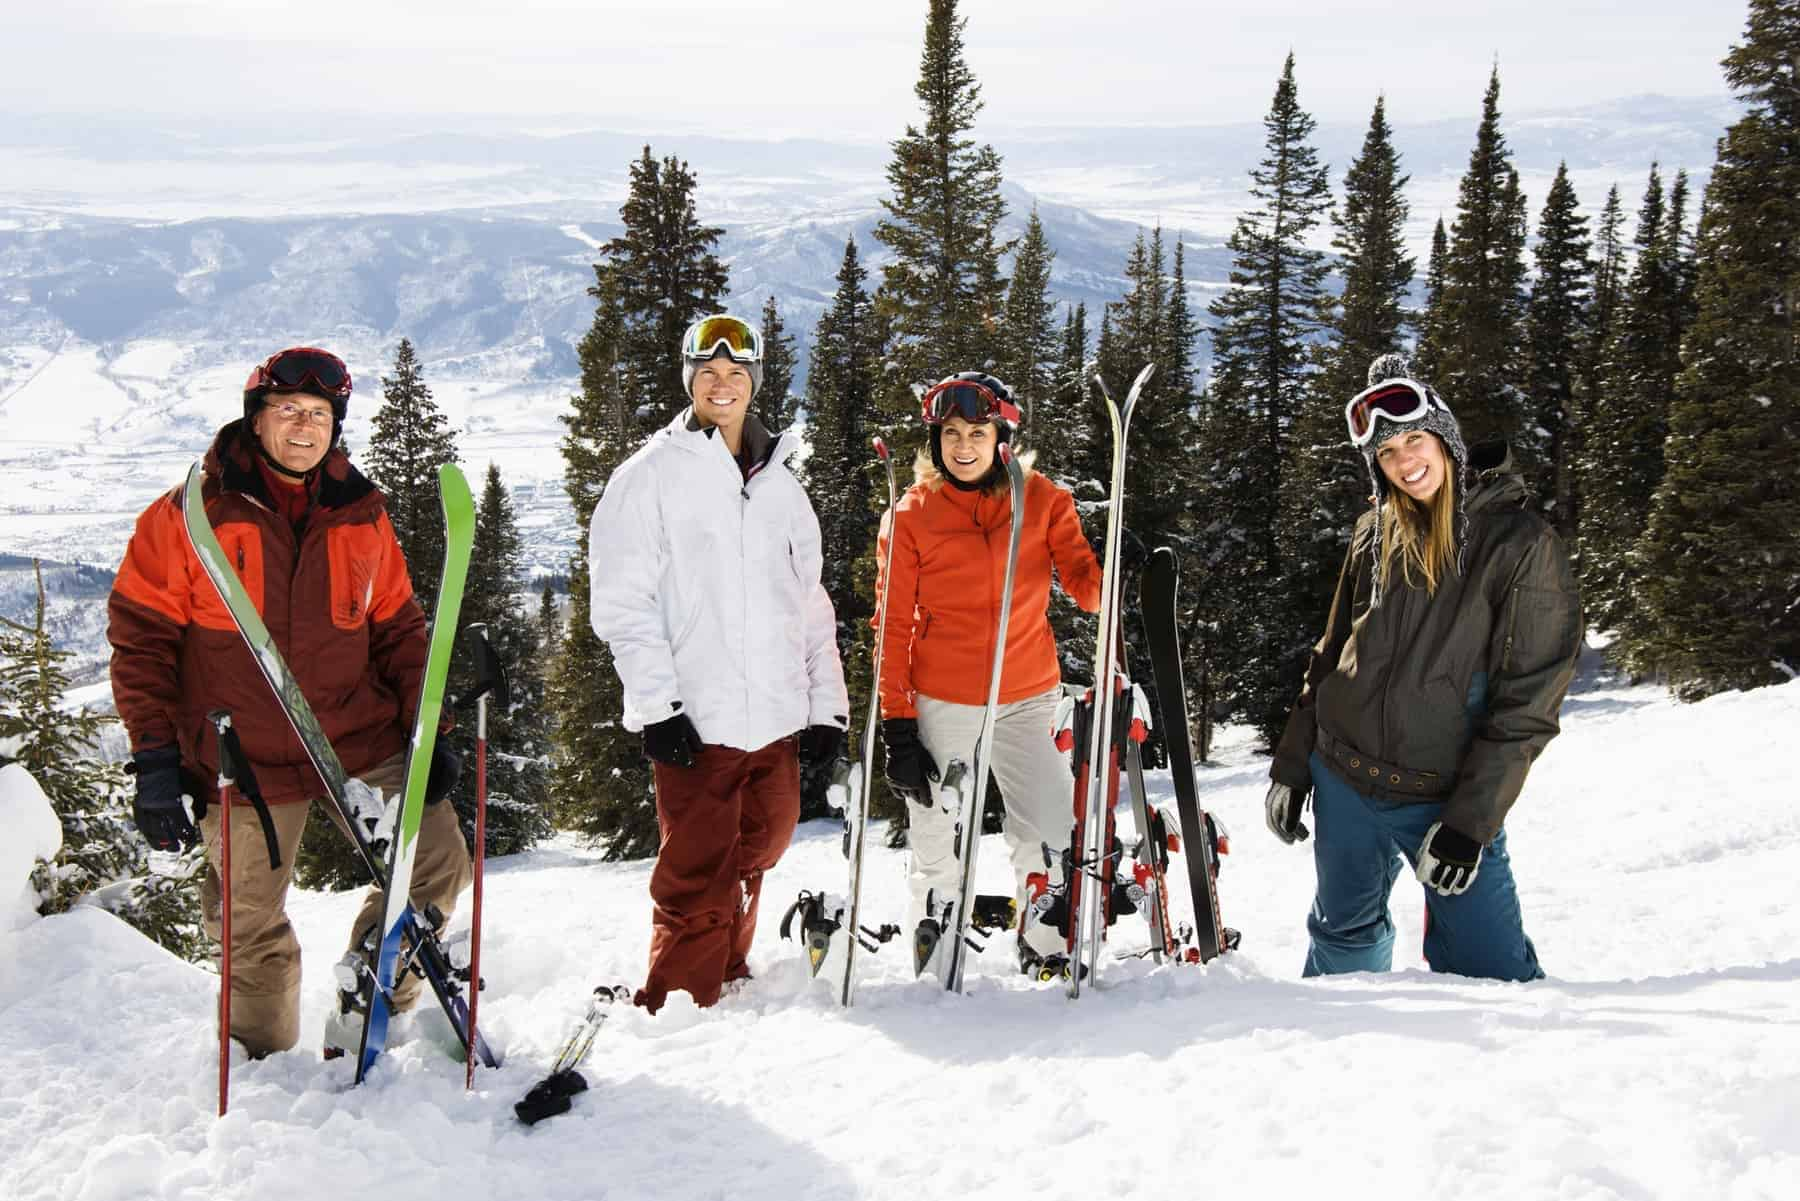 Best Skiresorts USA, Skiers Standing in Snow Smiling